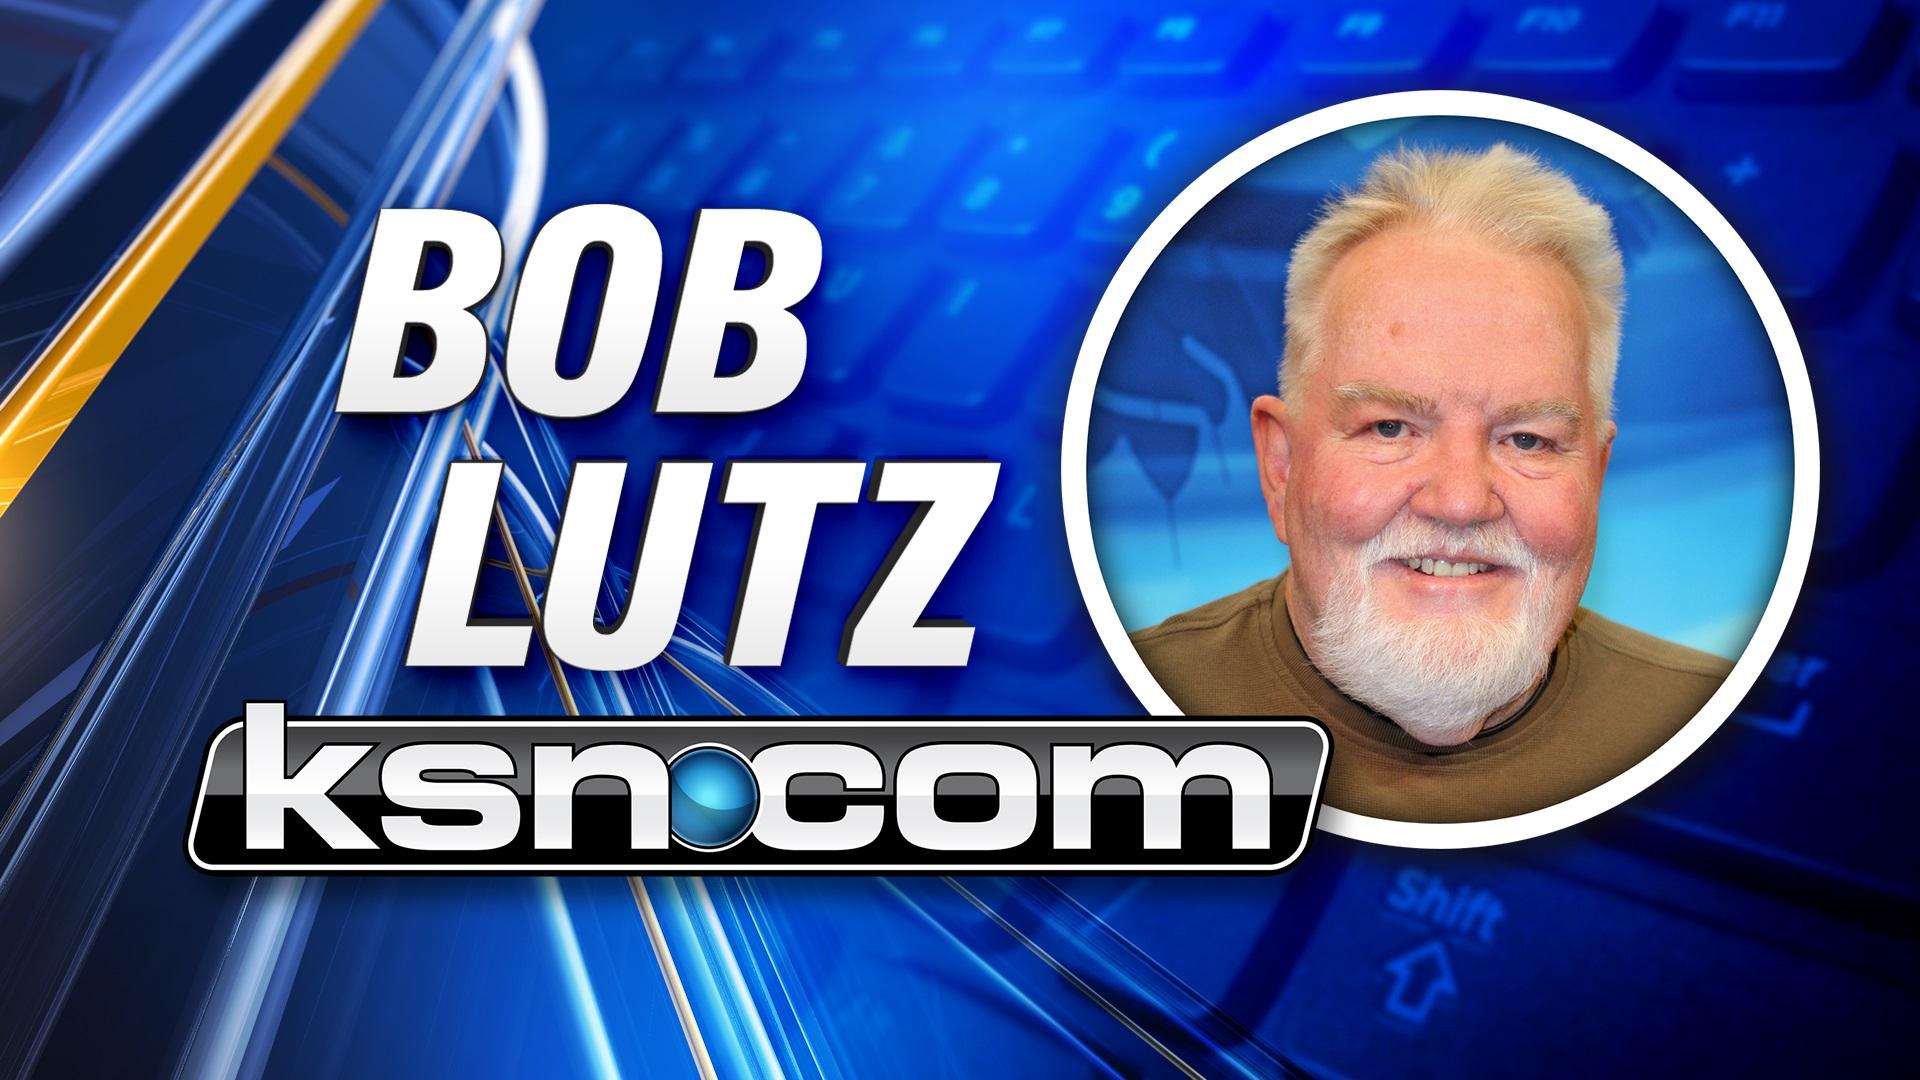 Bob Lutz KSN File